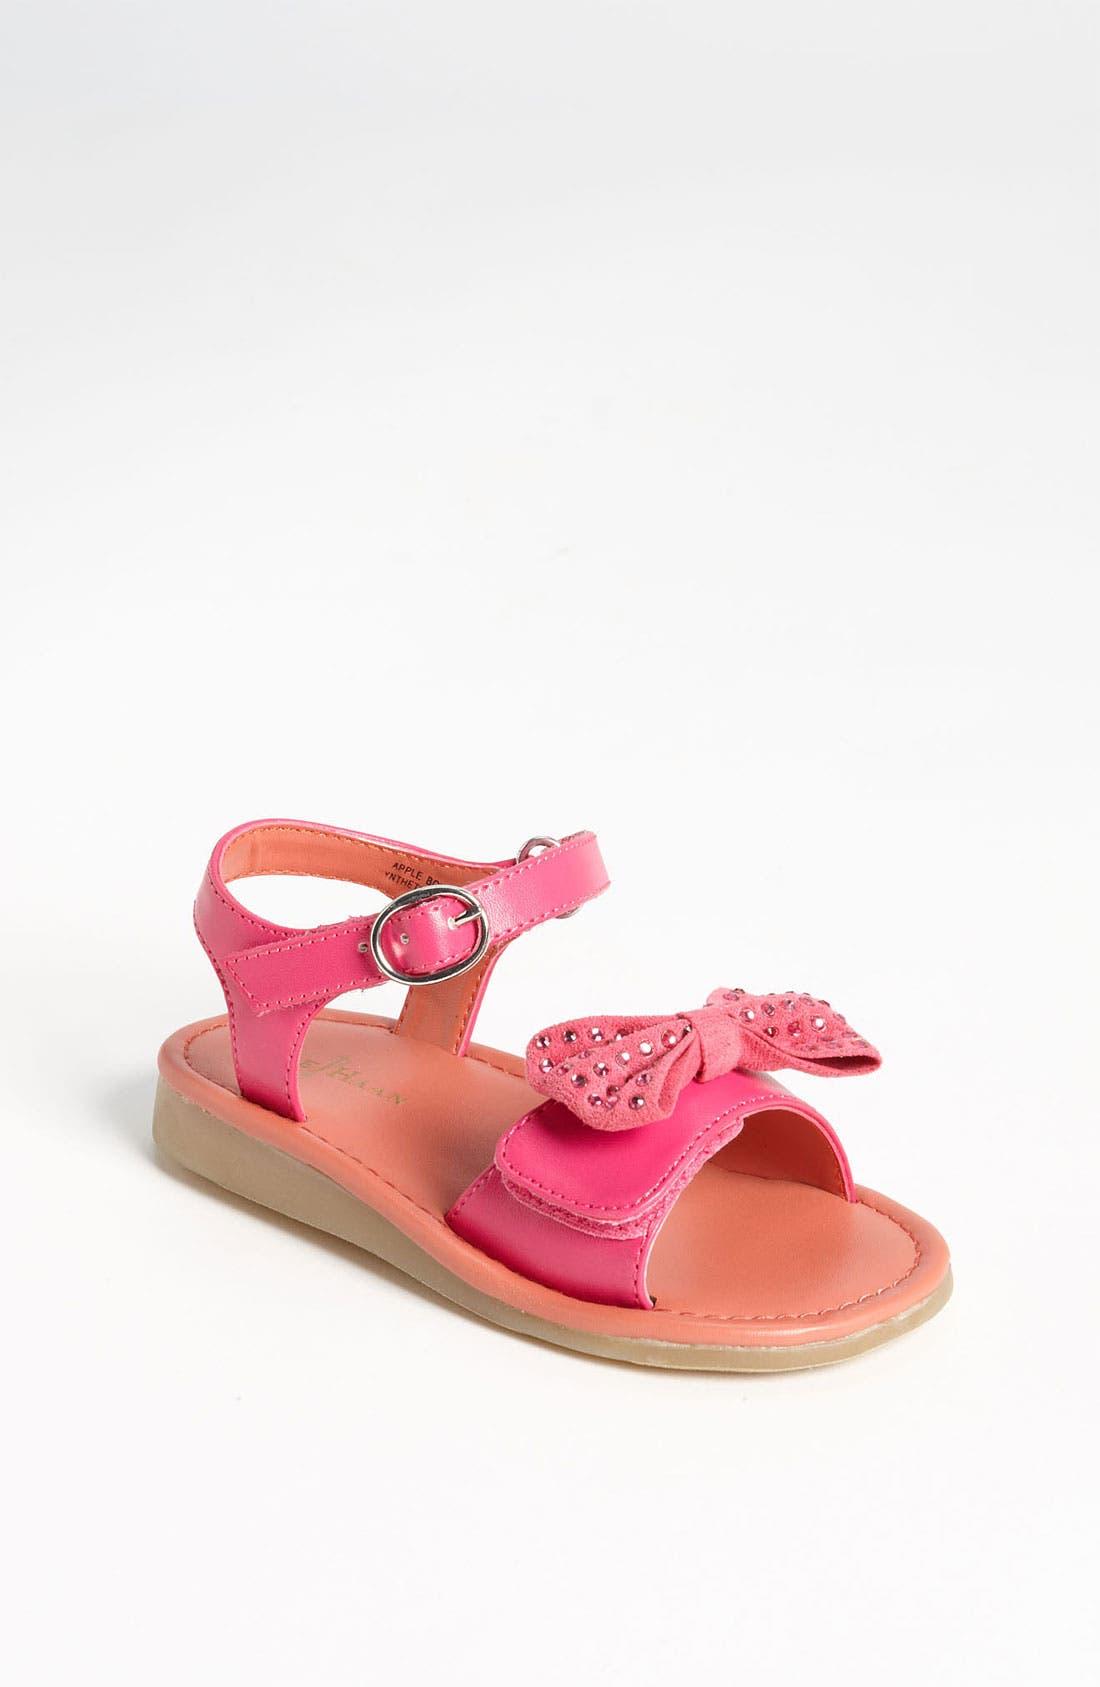 Alternate Image 1 Selected - Cole Haan 'Apple Bow' Sandal (Walker & Toddler)